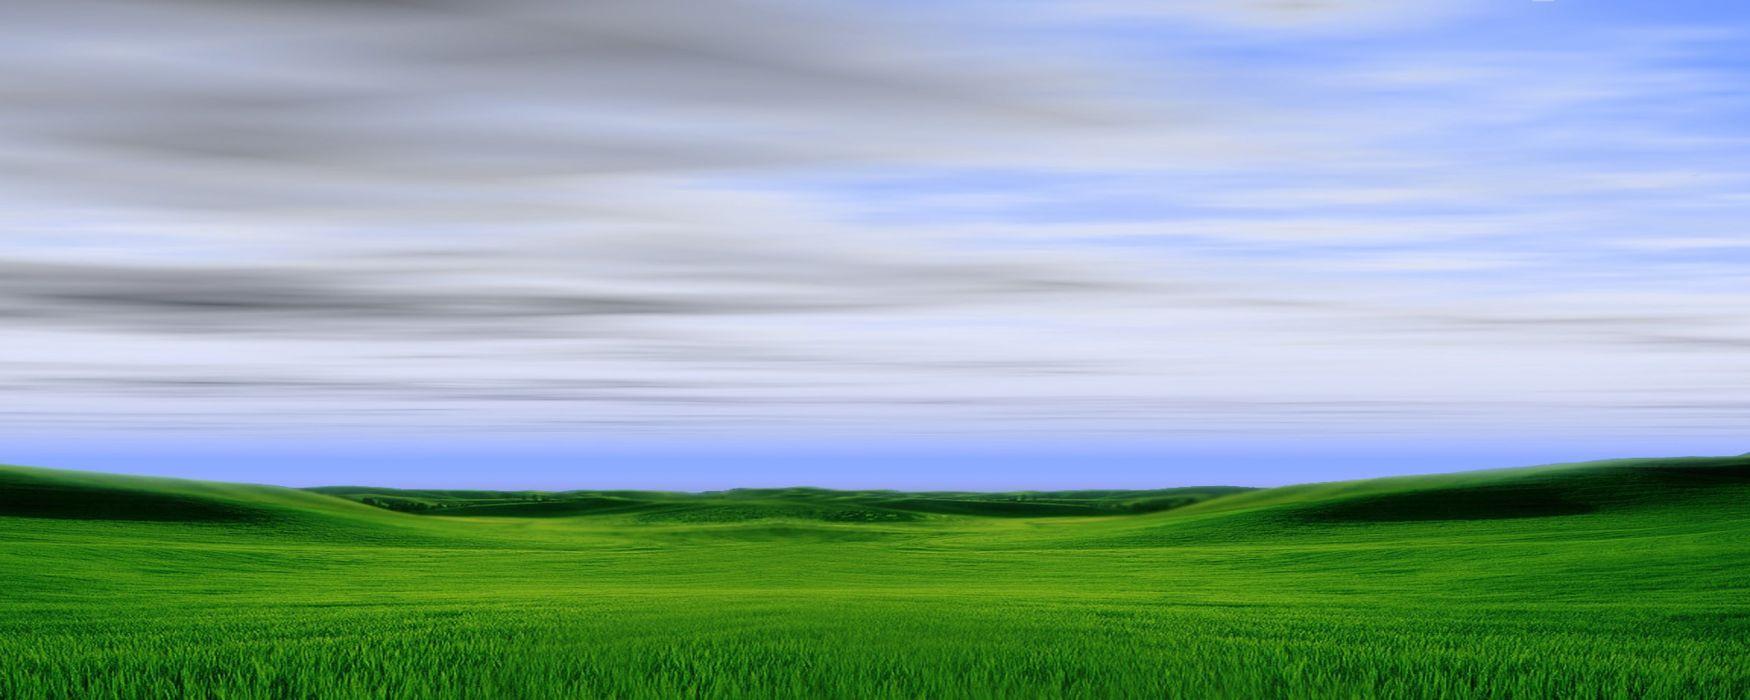 clouds landscapes Windows XP duel multiscreen wallpaper